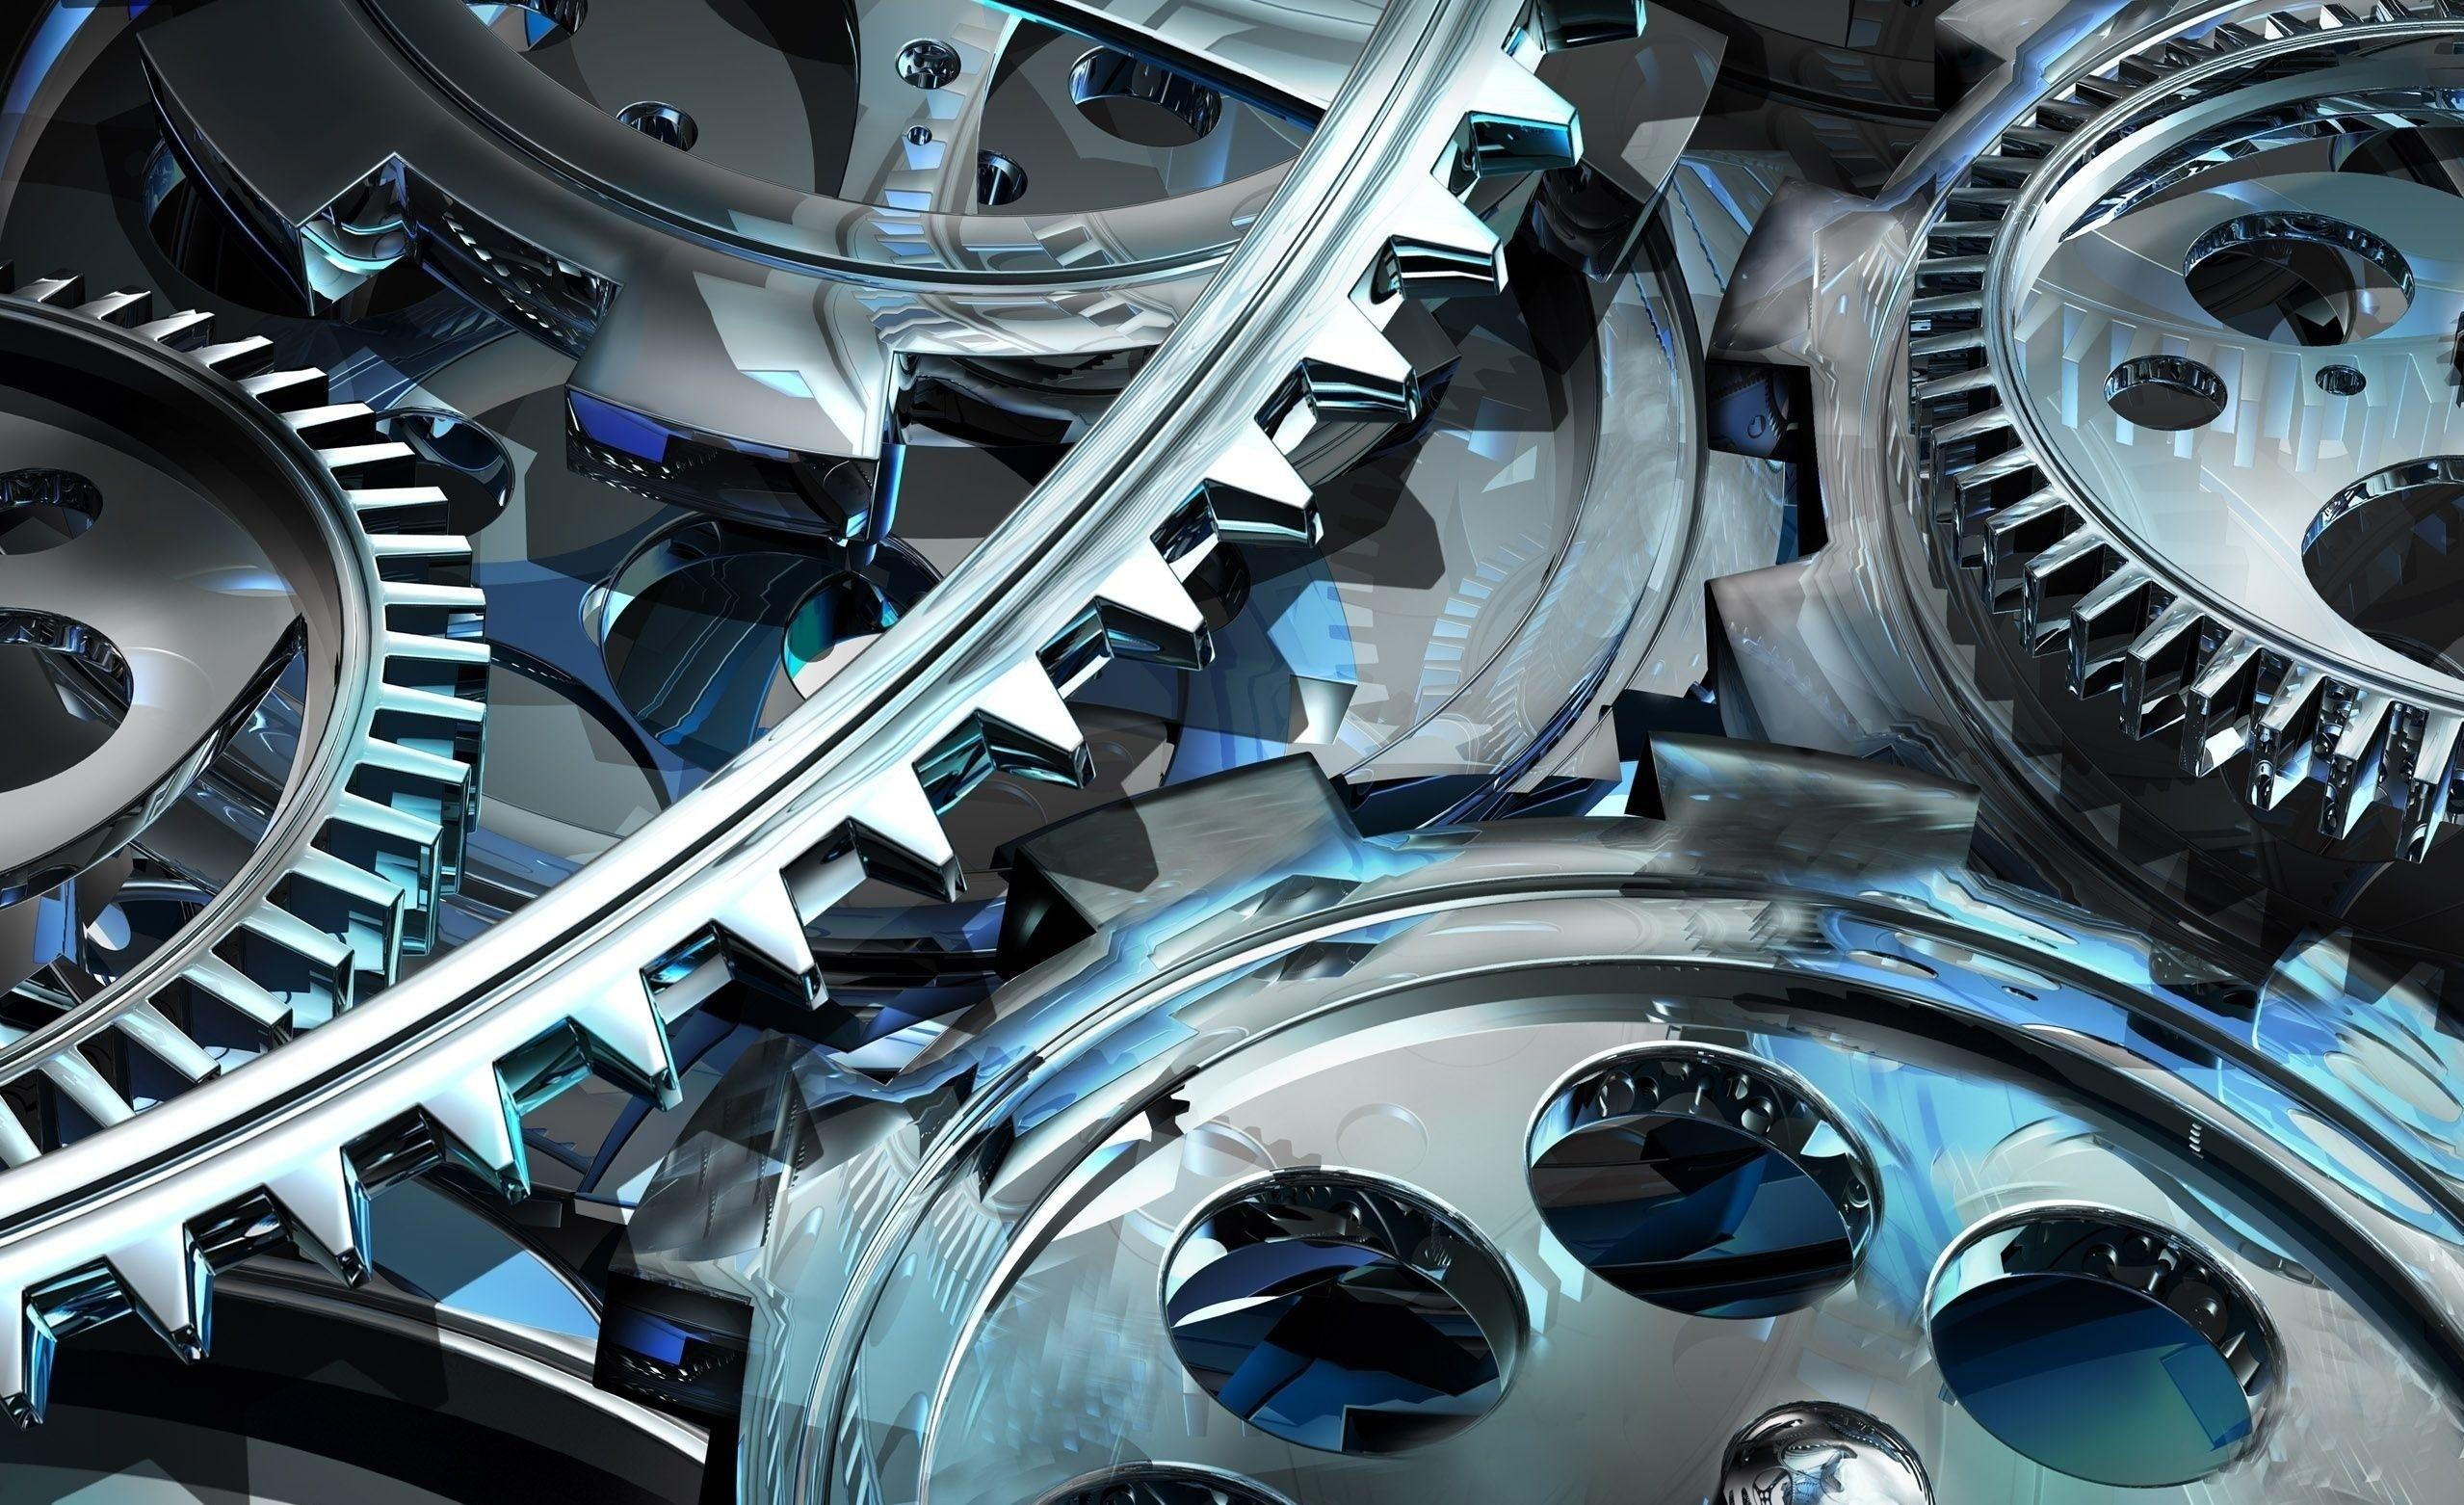 gear_art_mechanismx1562